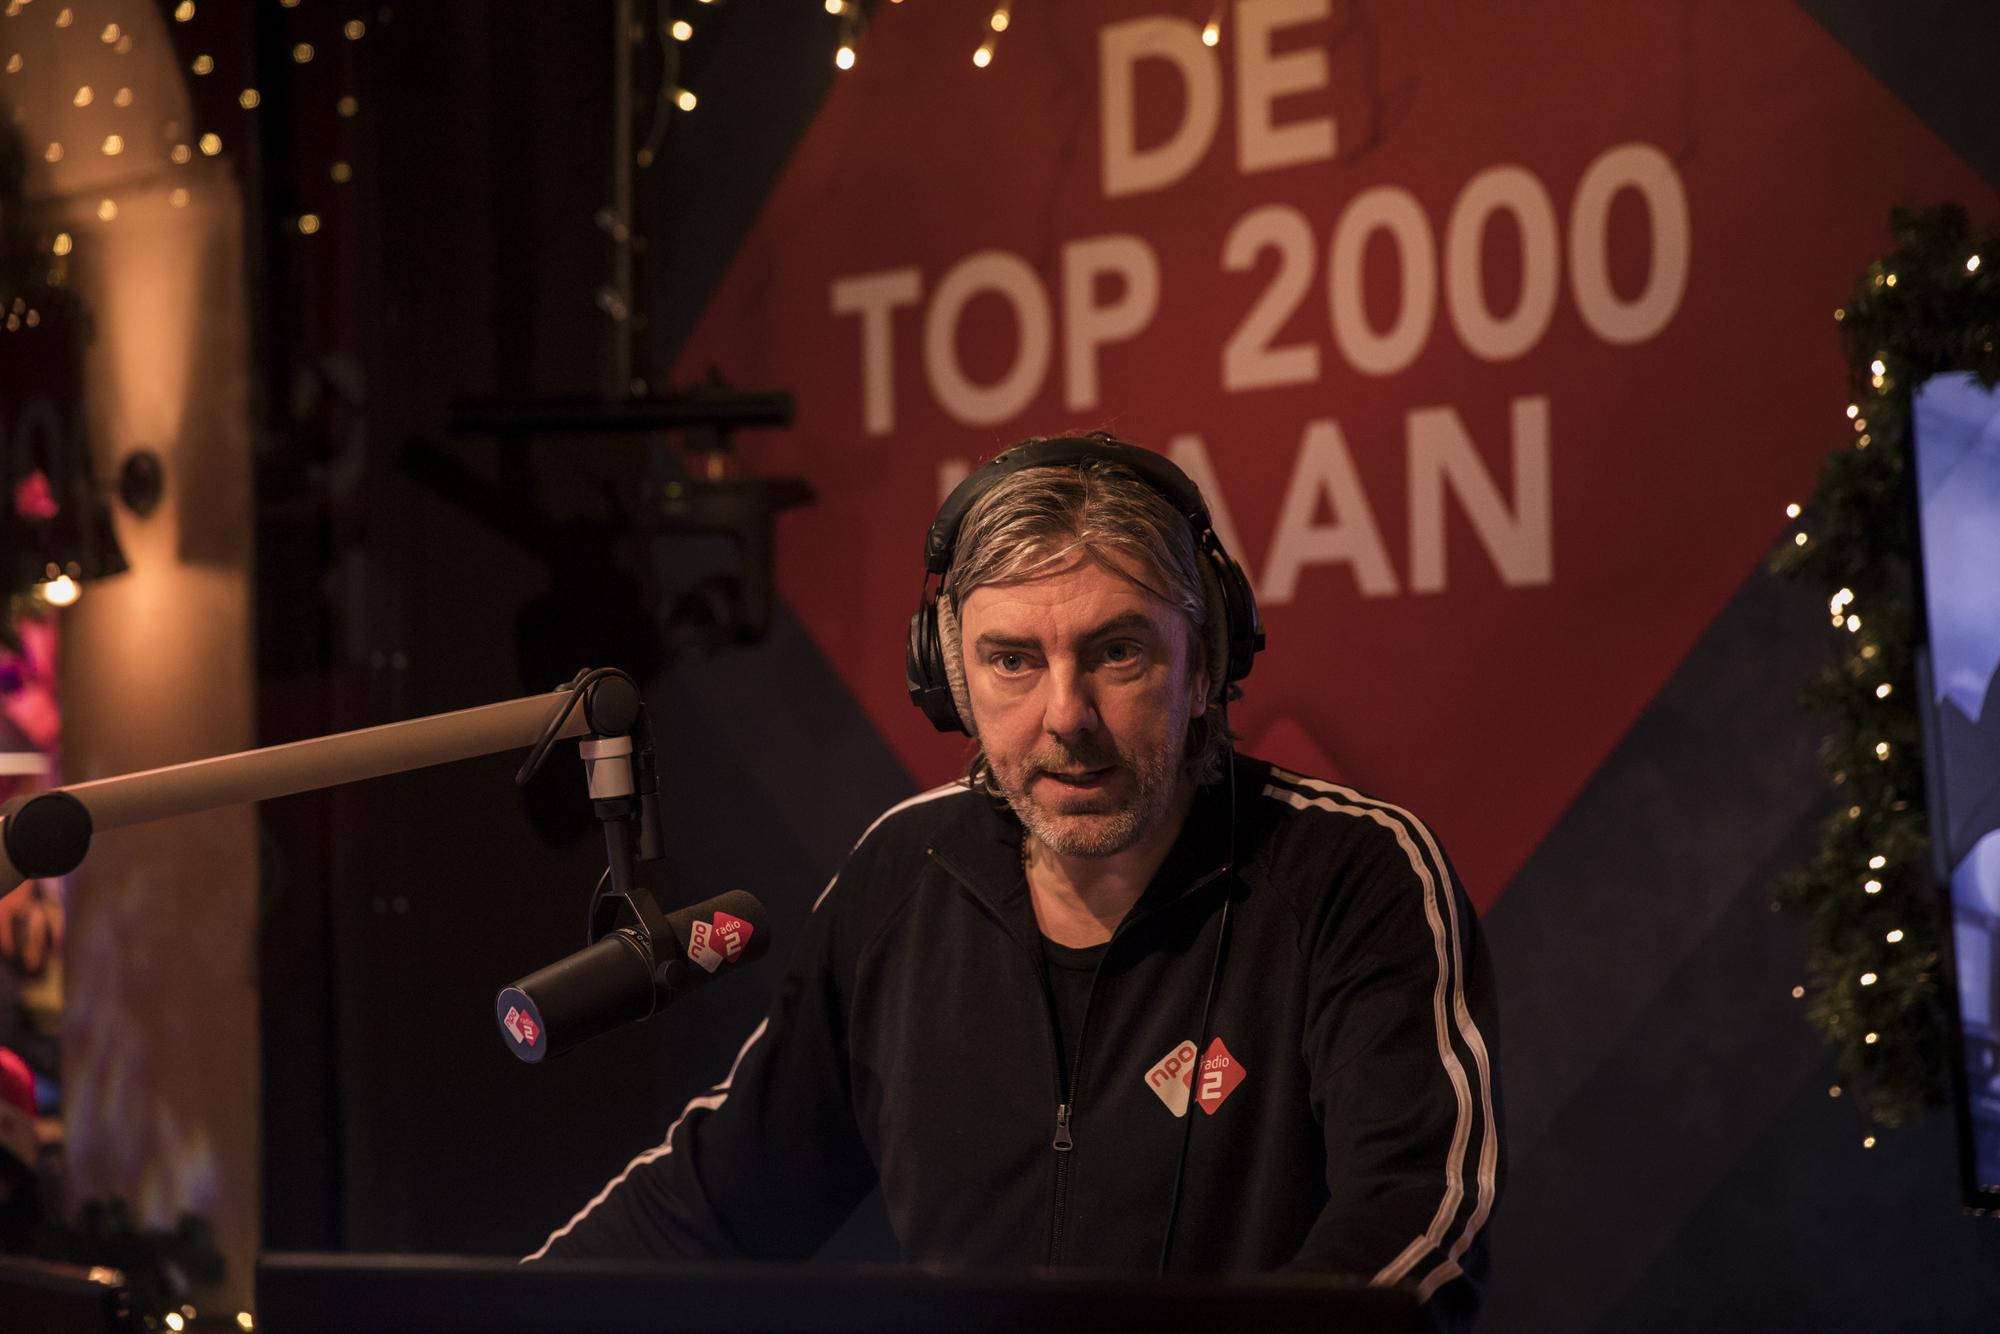 NPO Radio 2 populairste radiozender in 2018